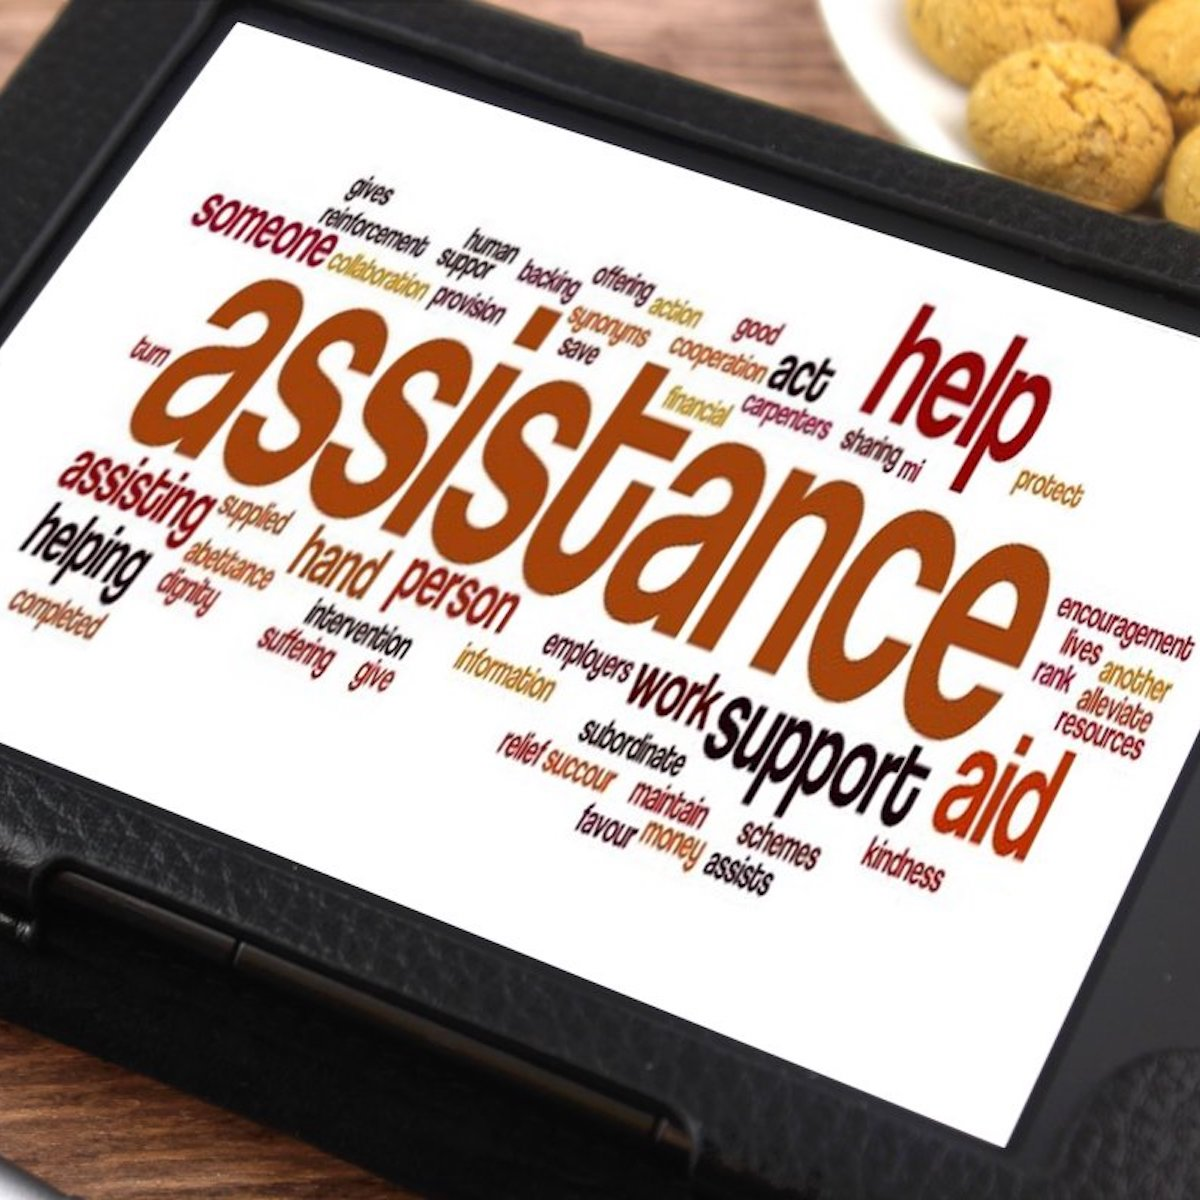 NAM Programs - Northwest Assistance Ministries